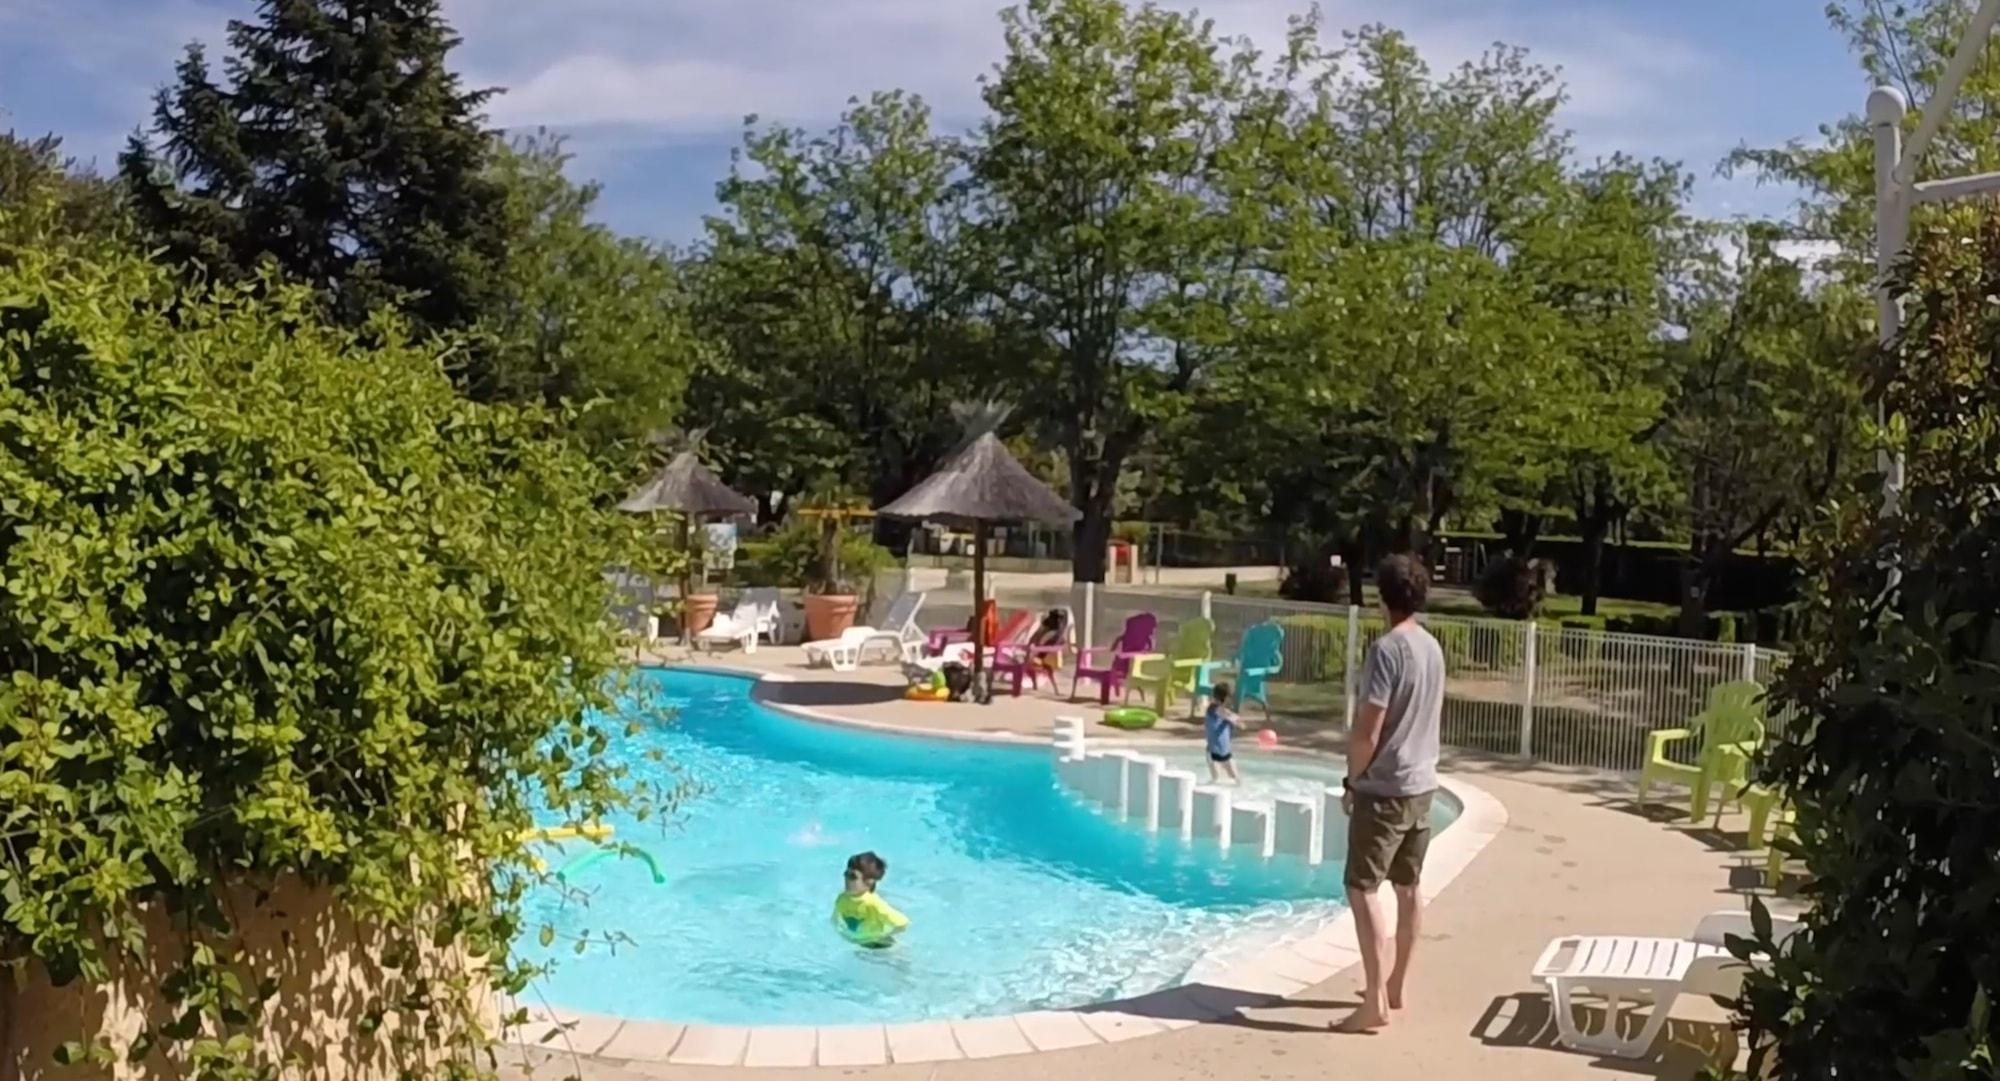 Camping Ardèche 3 Étoiles À Sampzon | Sun Camping dedans Camping Ardèche Avec Piscine